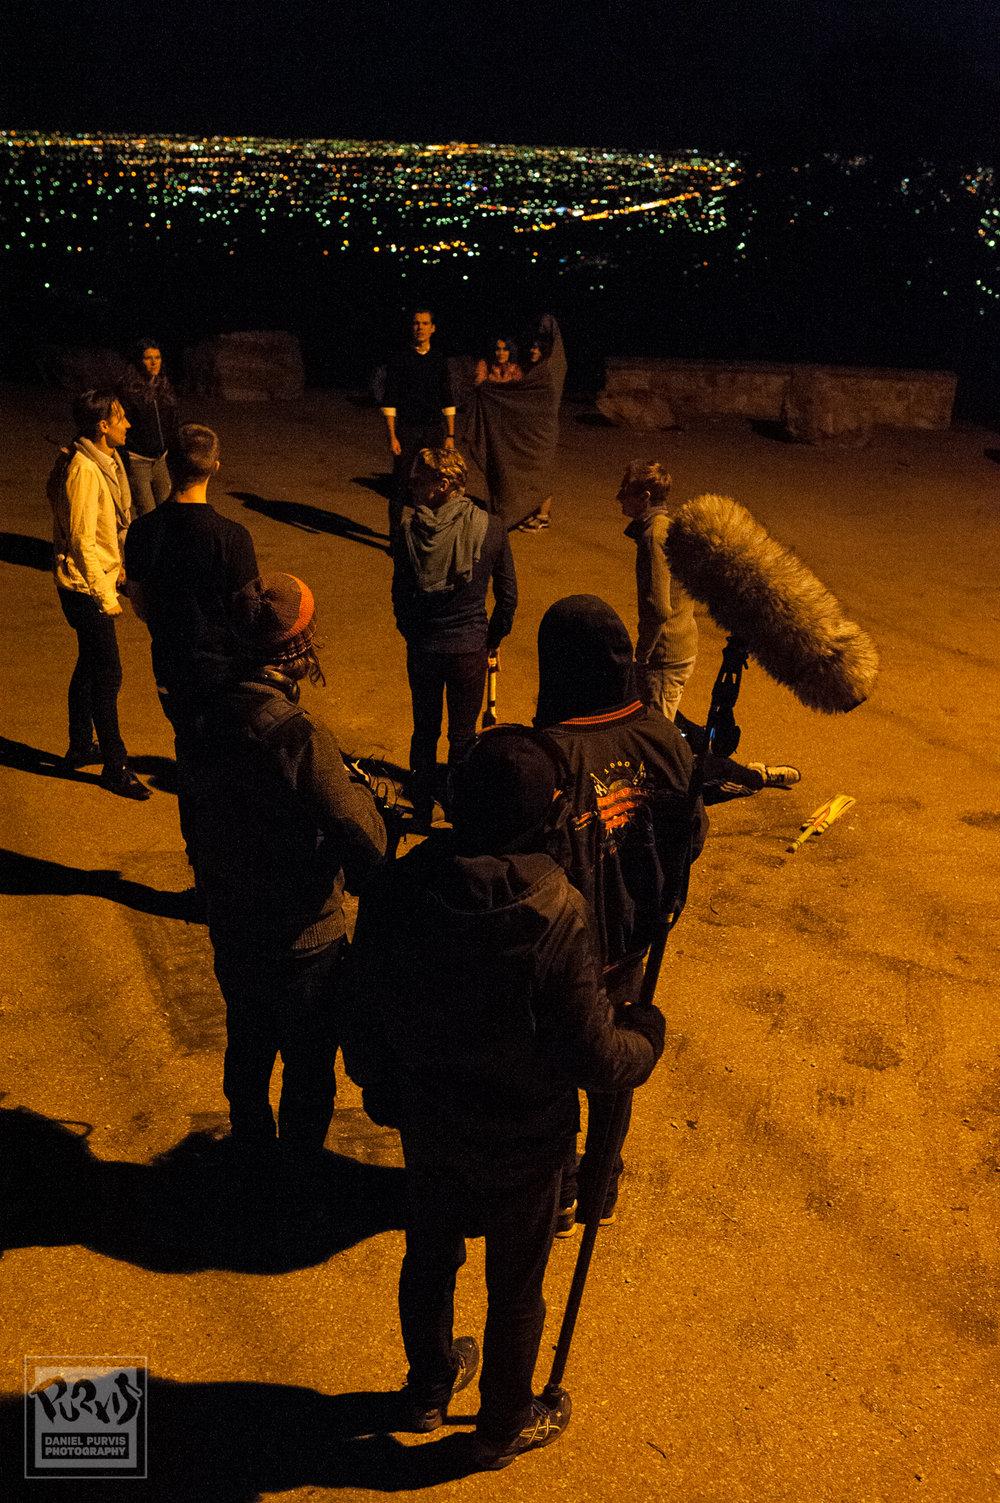 Runaway Moon_BTS_daniel purvis__TRB2012.jpg